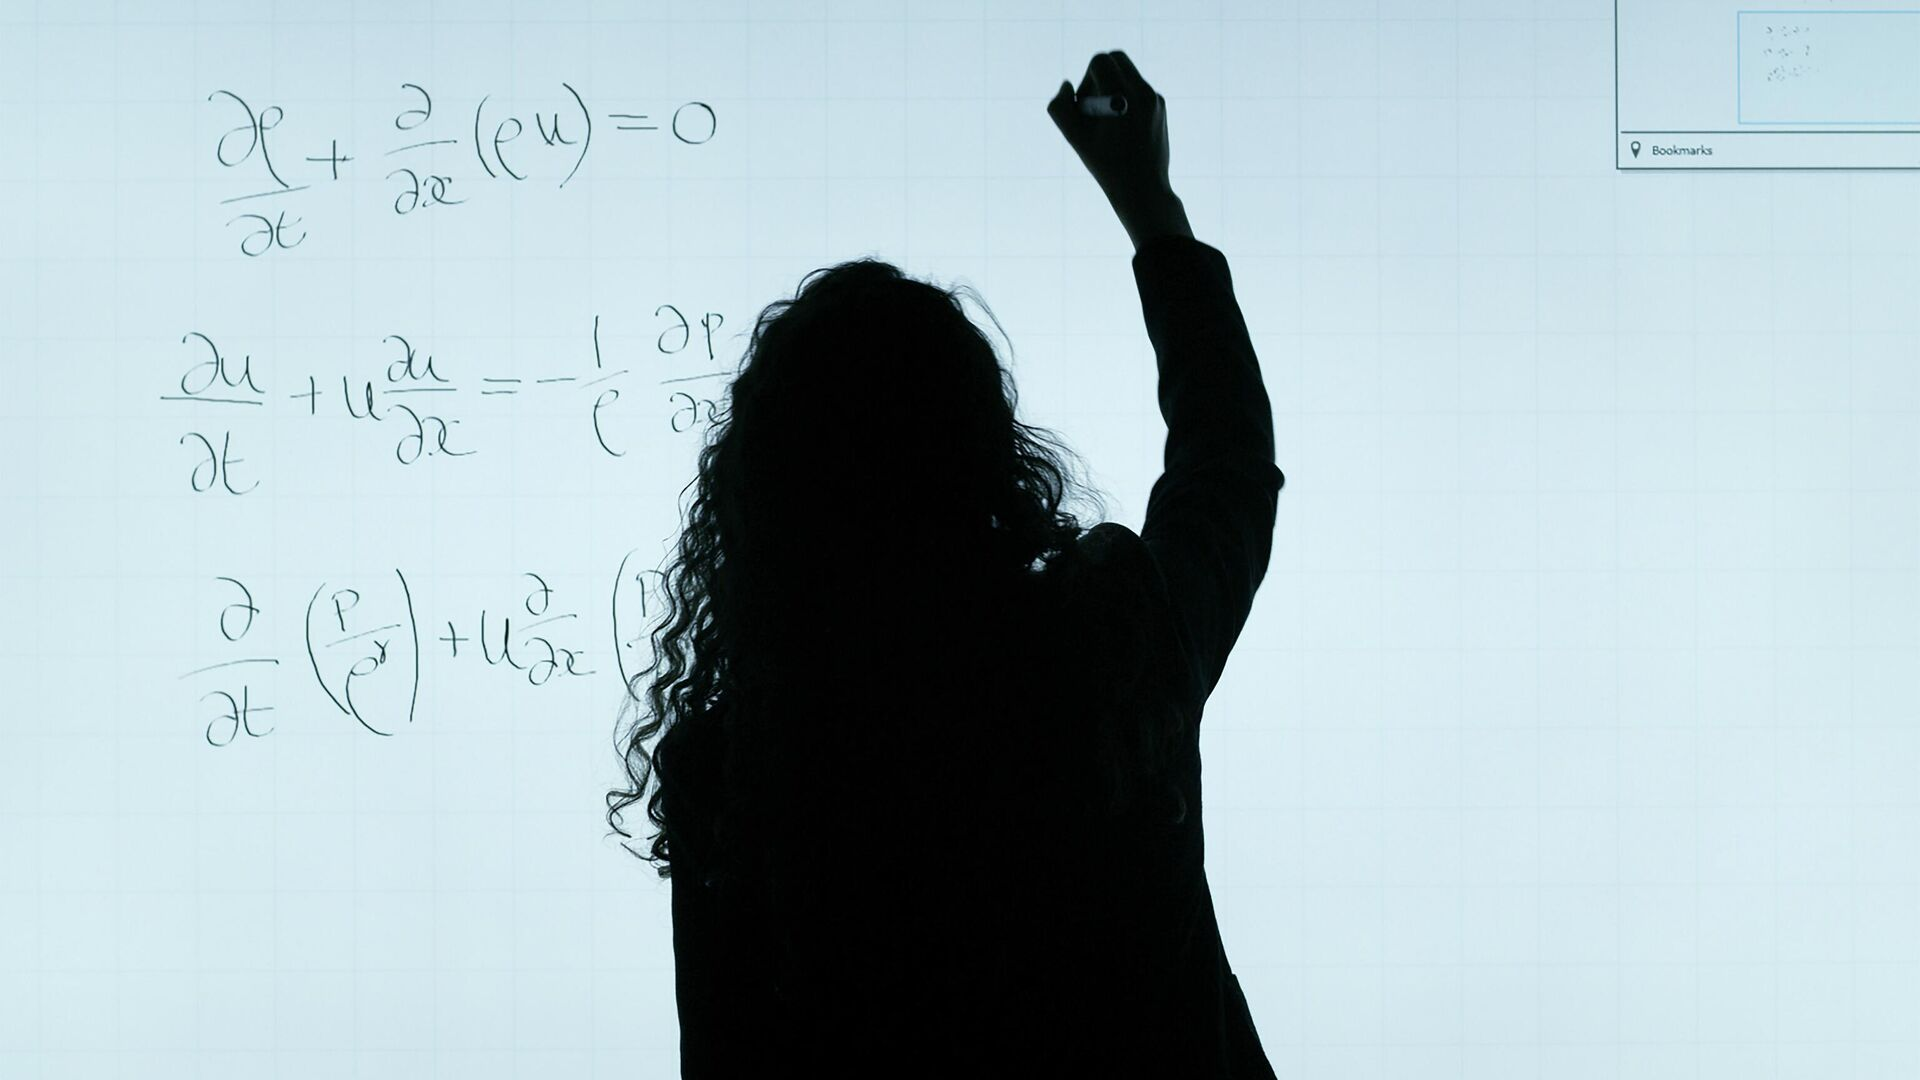 Девушка пишет формулы на доске - Sputnik Узбекистан, 1920, 21.09.2021